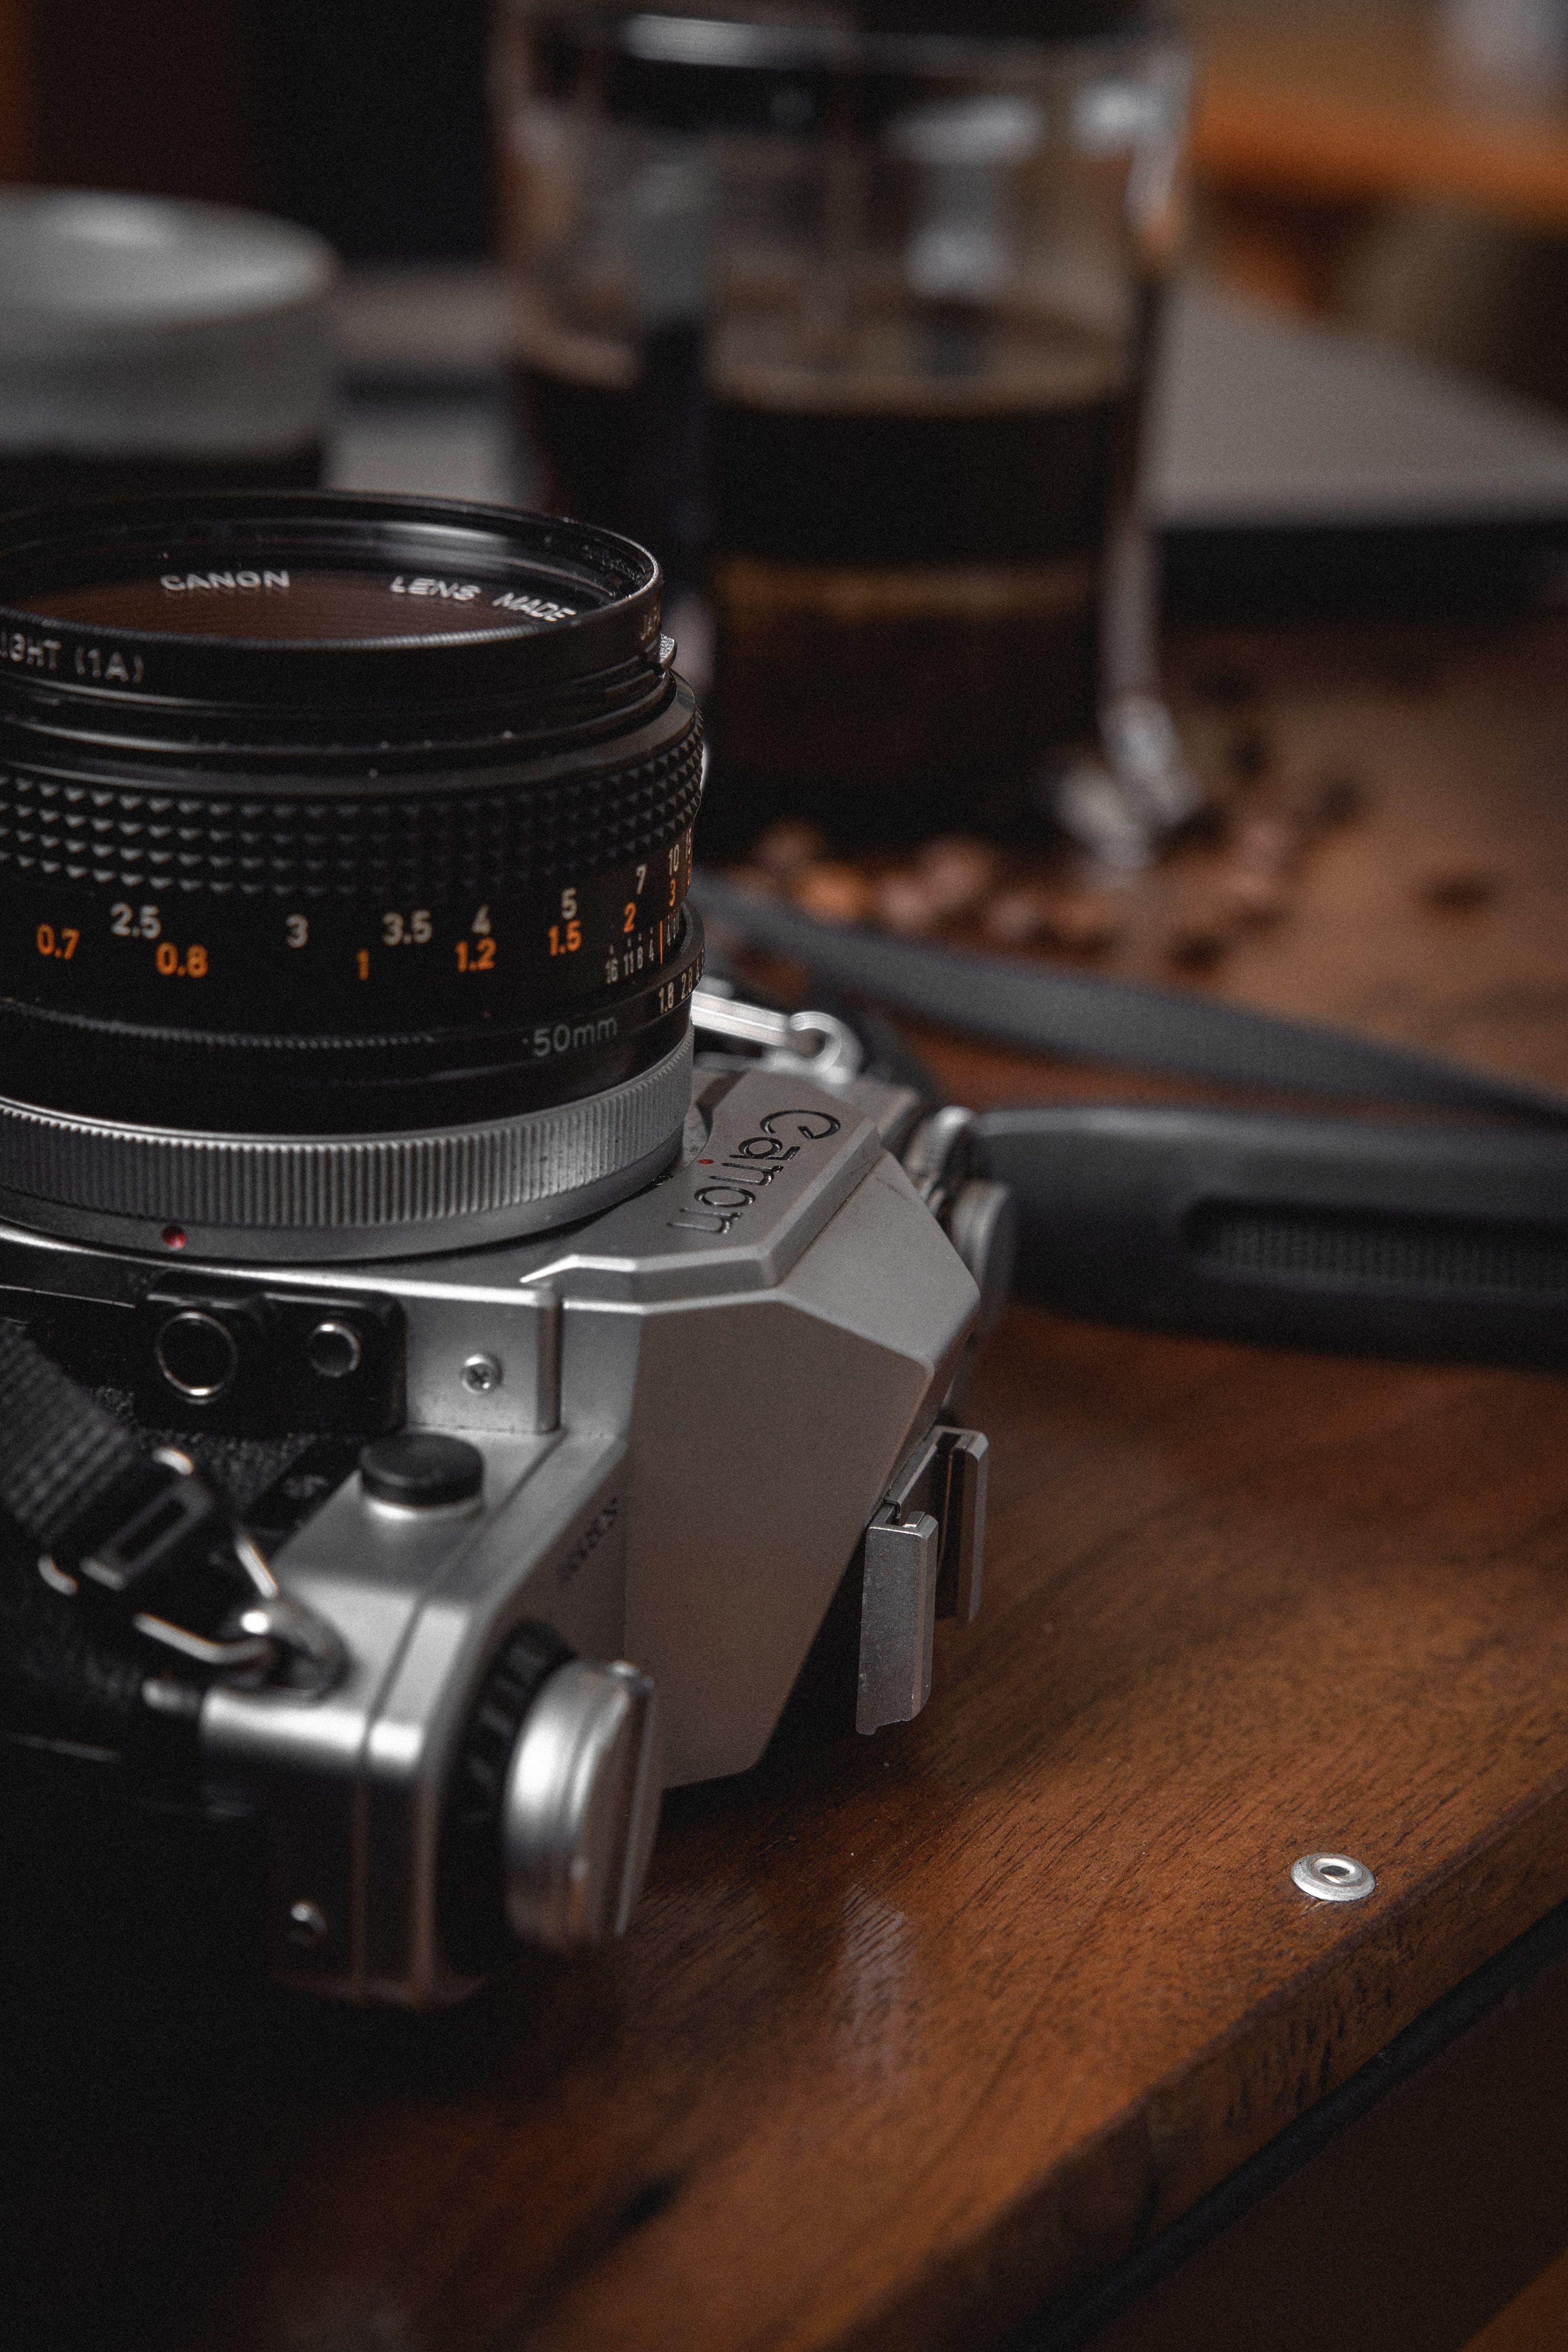 Kostnadsfri bild av elektronik, kamera, kanon, klassisk